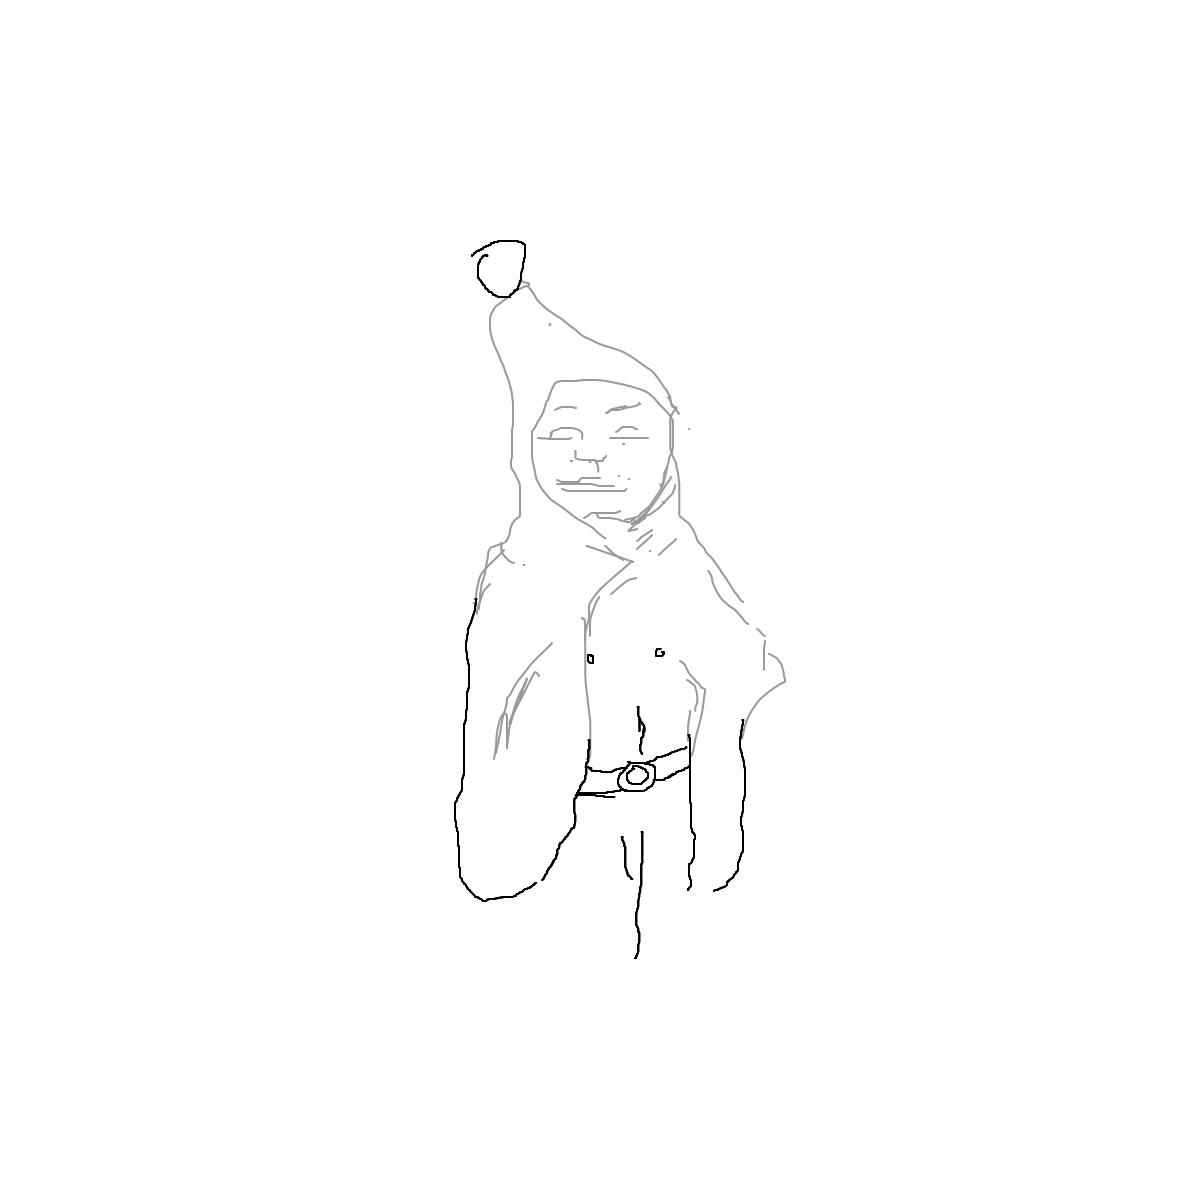 BAAAM drawing#689 lat:53.4072837829589840lng: -2.9885601997375490